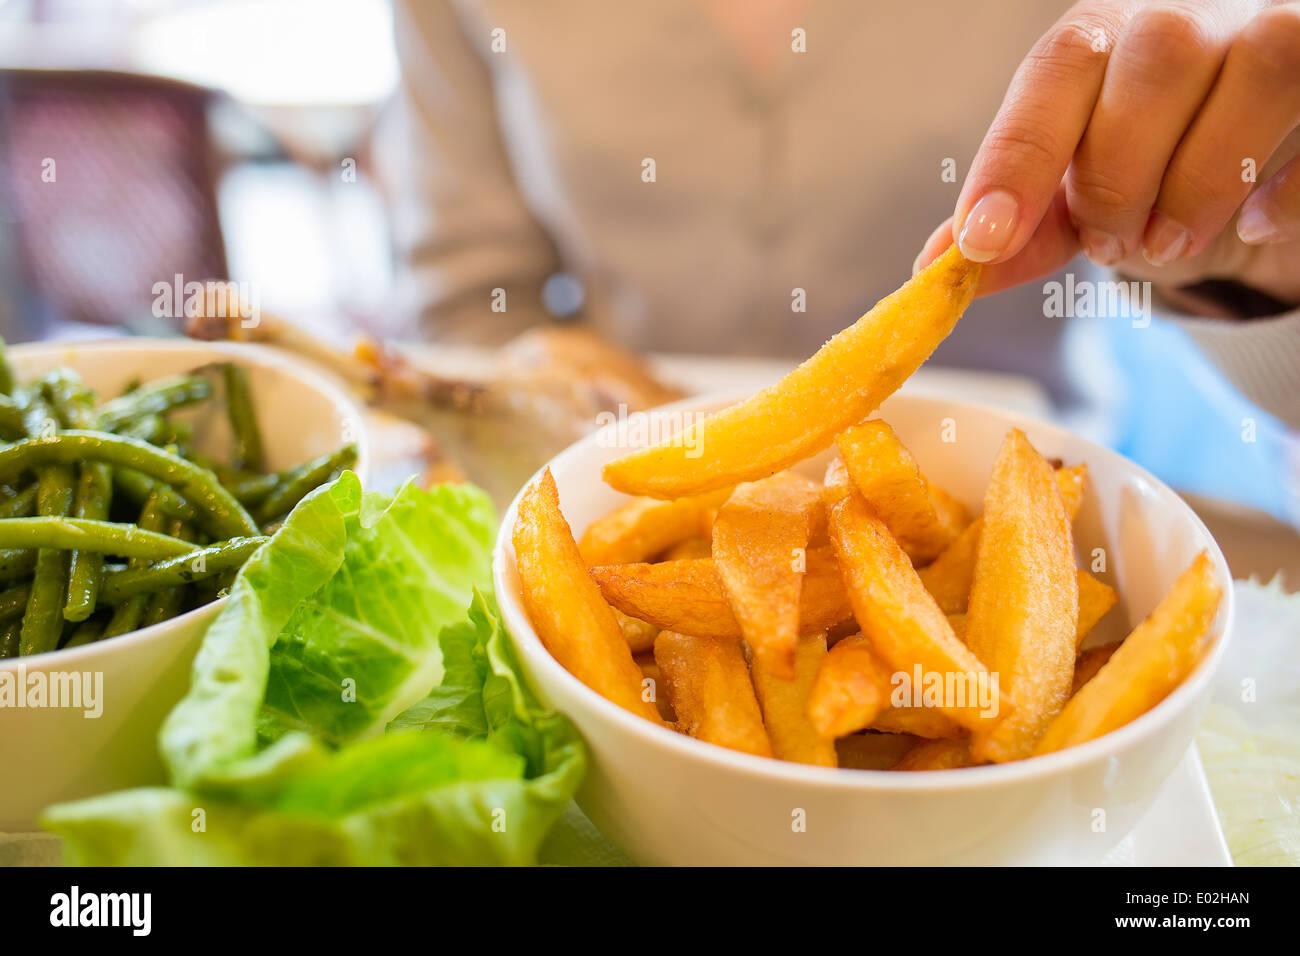 Female eating meat close-up finger bar indoor - Stock Image